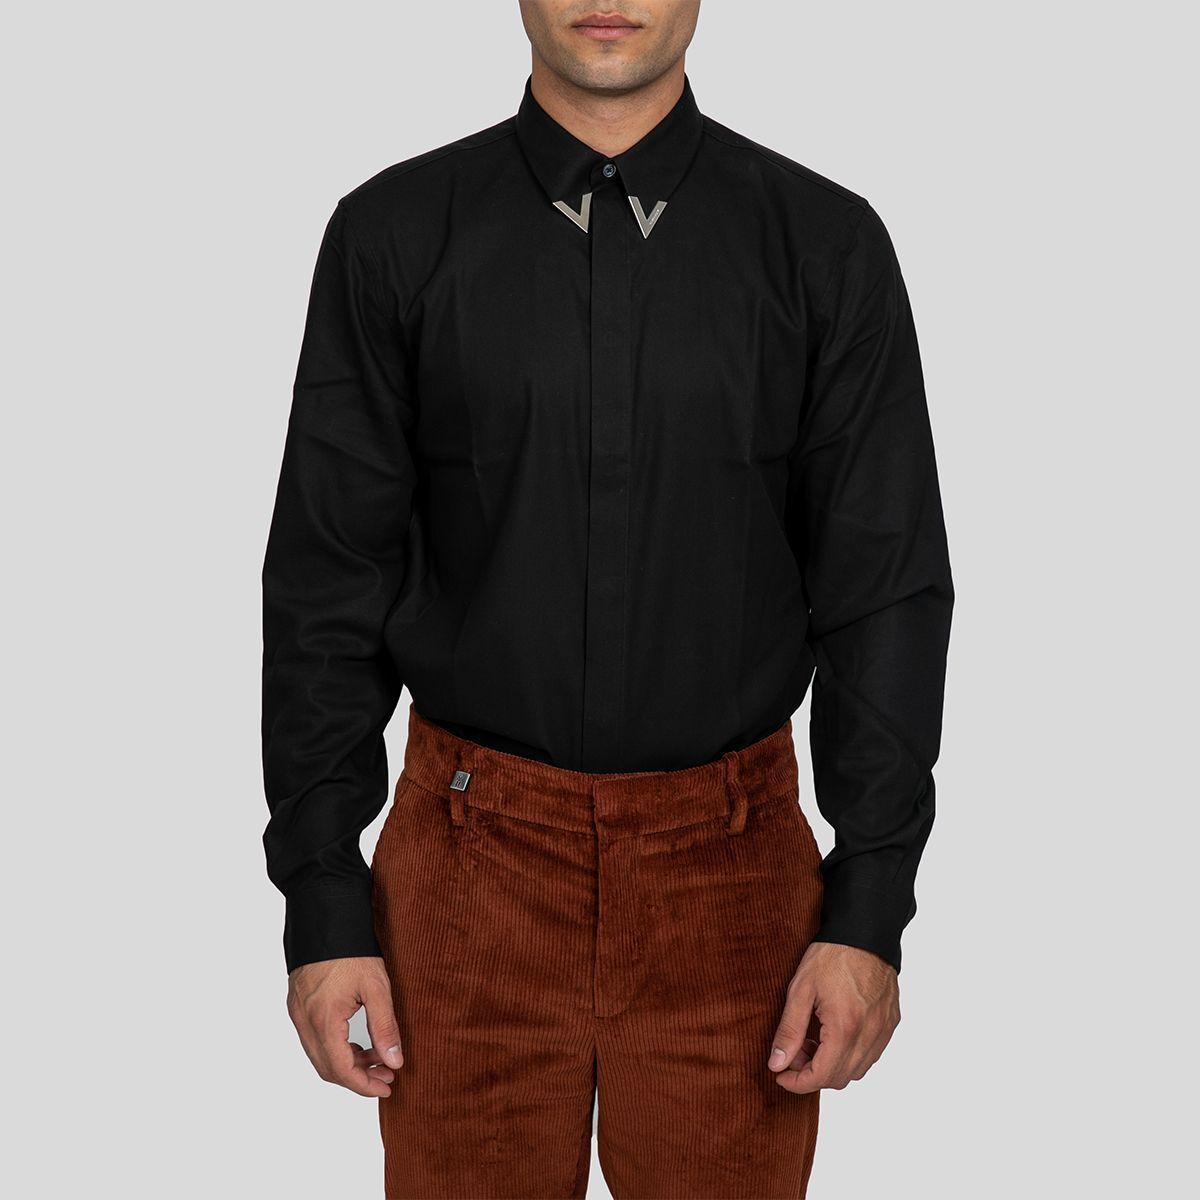 GIVENCHYBlack Shirt with Metallic Tips Γιακάς με χρυσές λεπτομέρειες Μακριά μανίκια Κλείσιμο με κρυφά κουμπιά Μέγεθος δείγματος:39 Σύνθεση: 100% Βαμβάκι